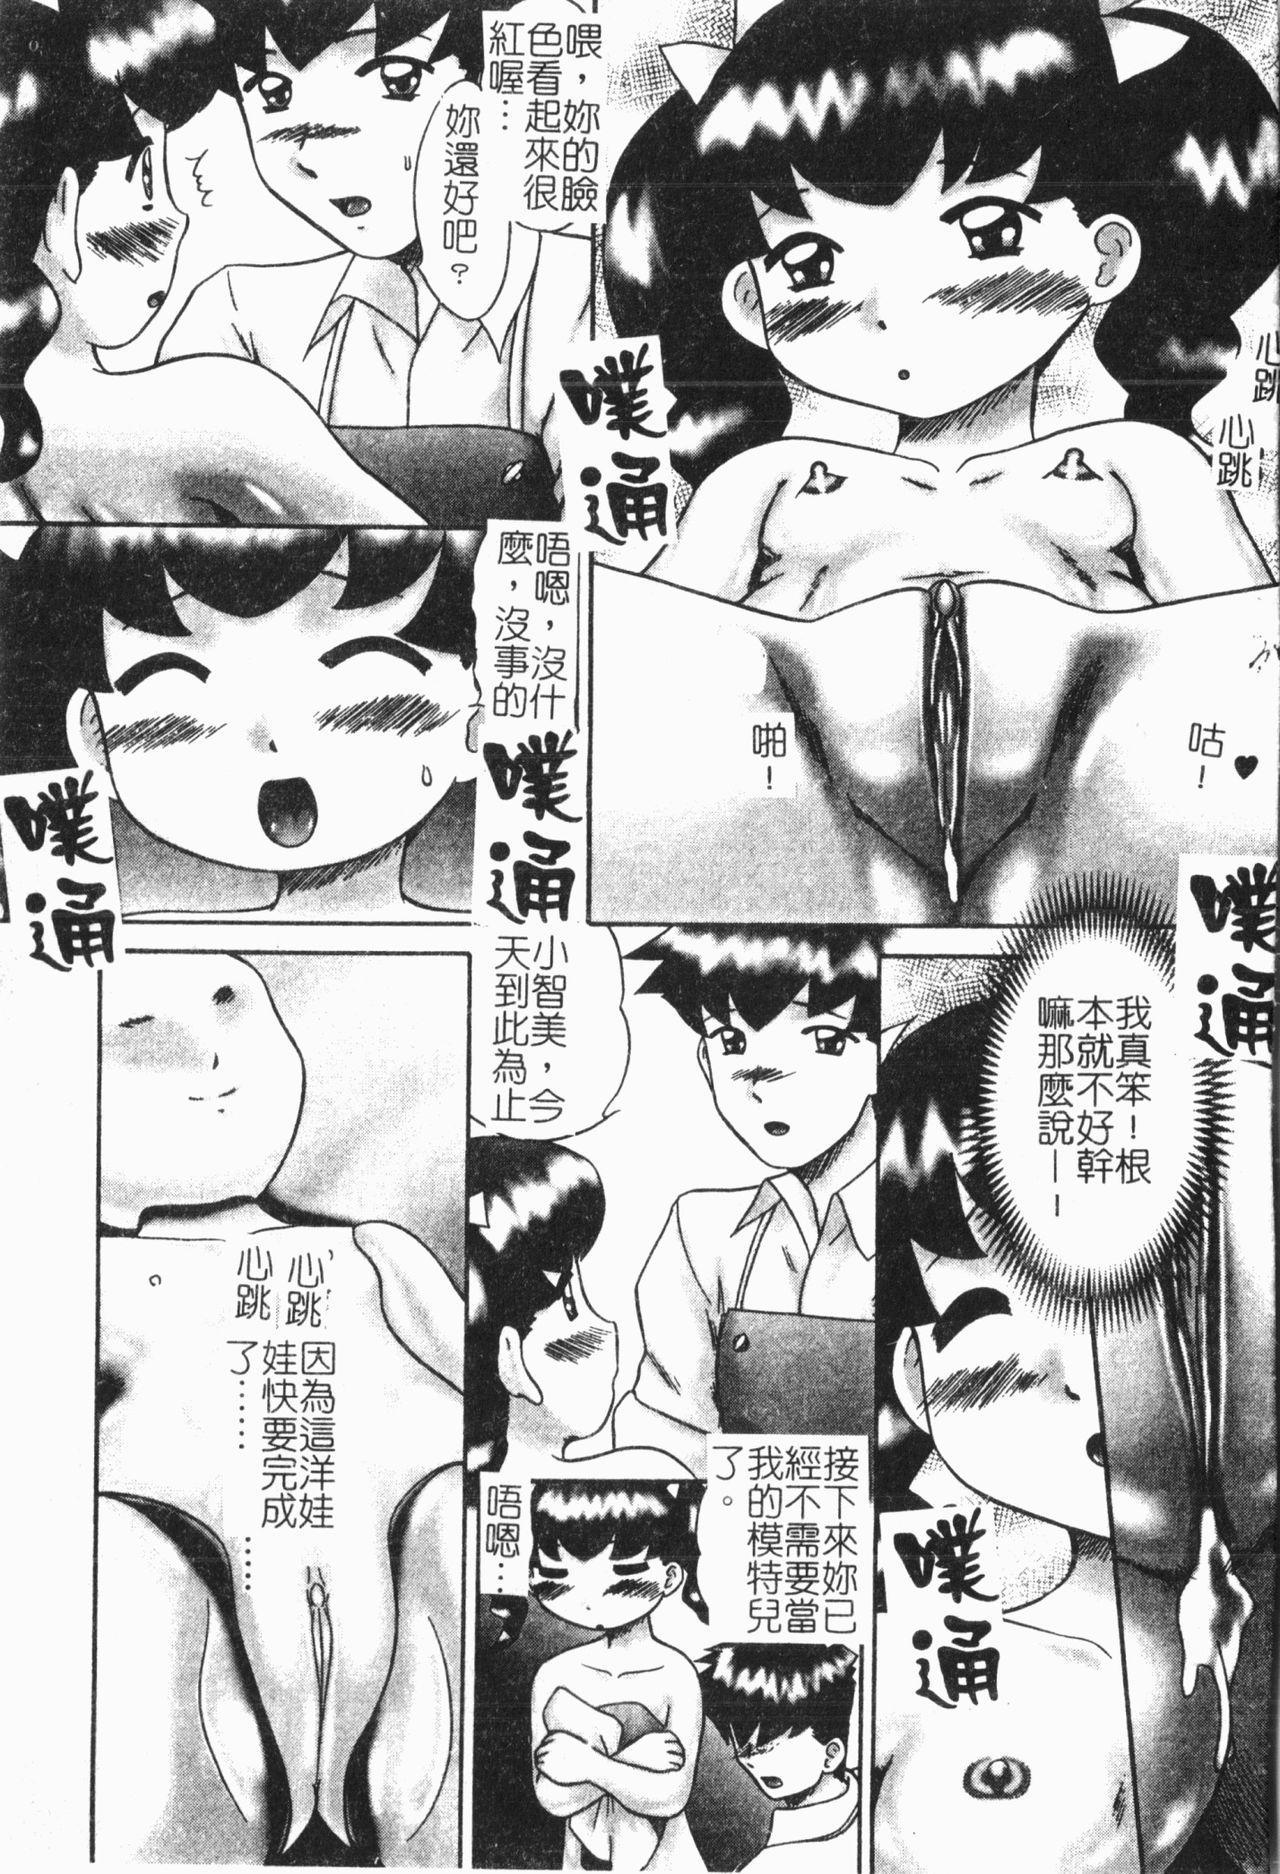 Imouto Koishi 6 37